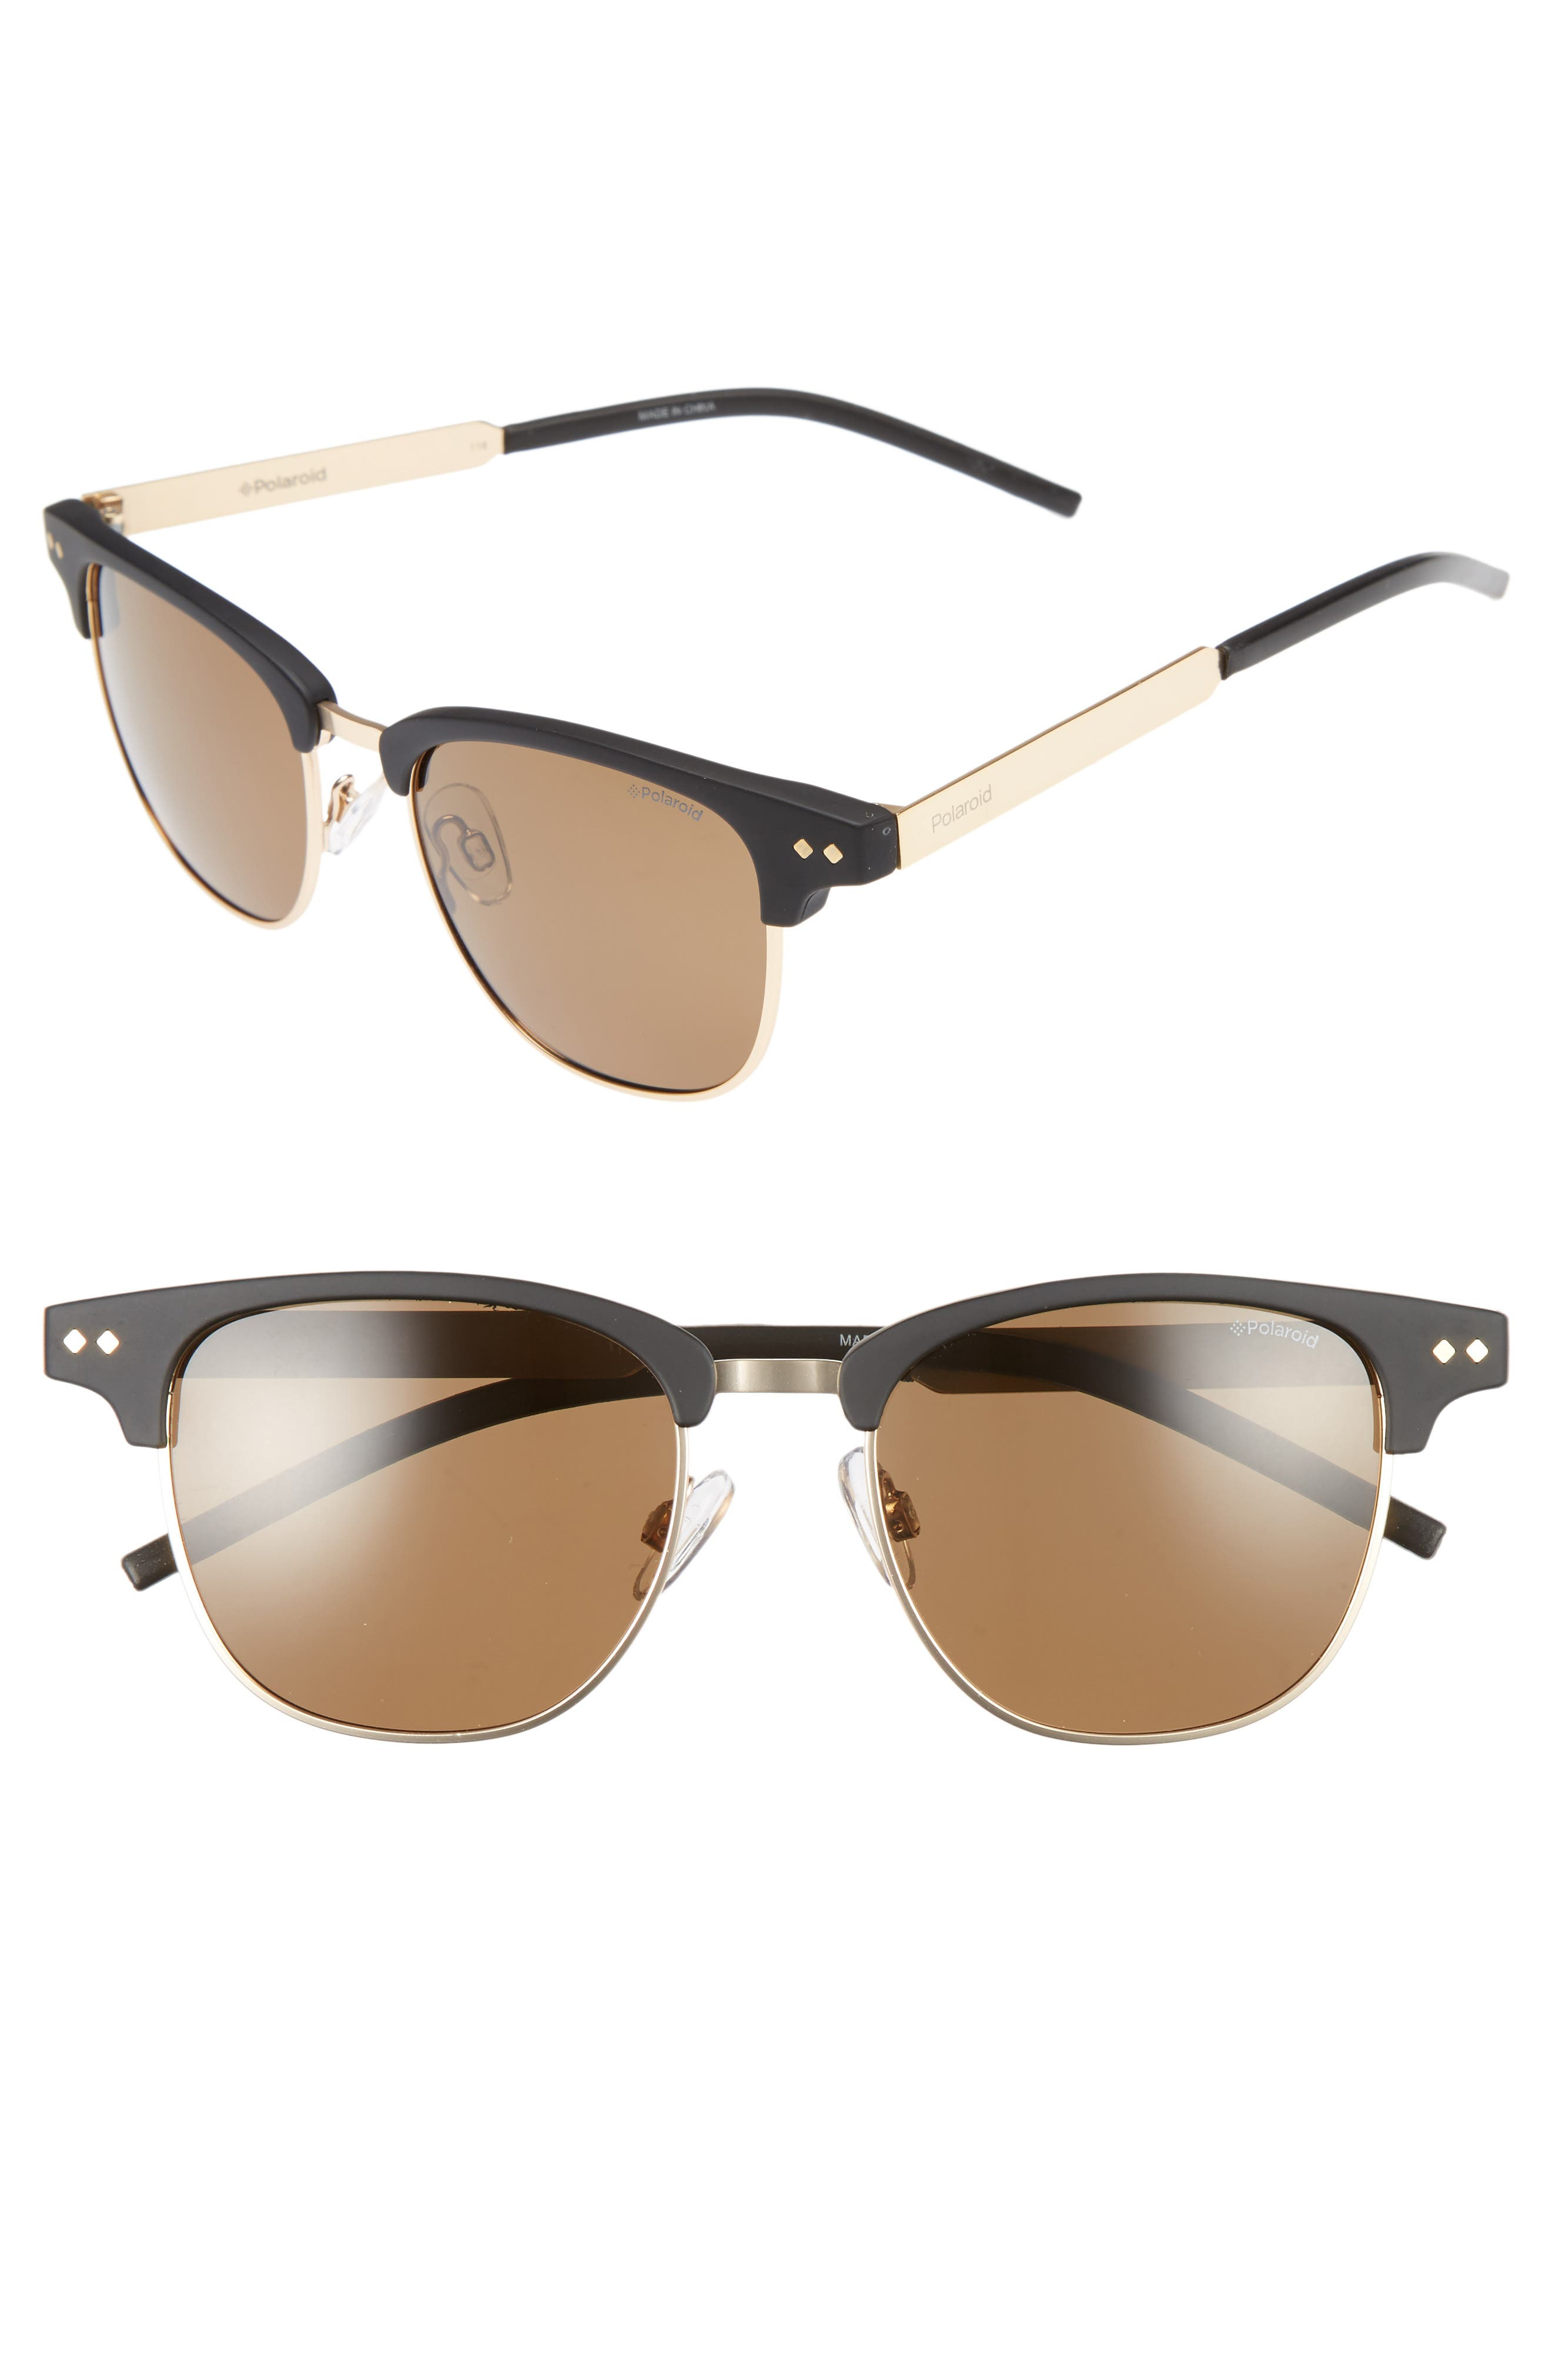 51mm Polarized Cat Eye Sunglasses,                             Main thumbnail 1, color,                             001